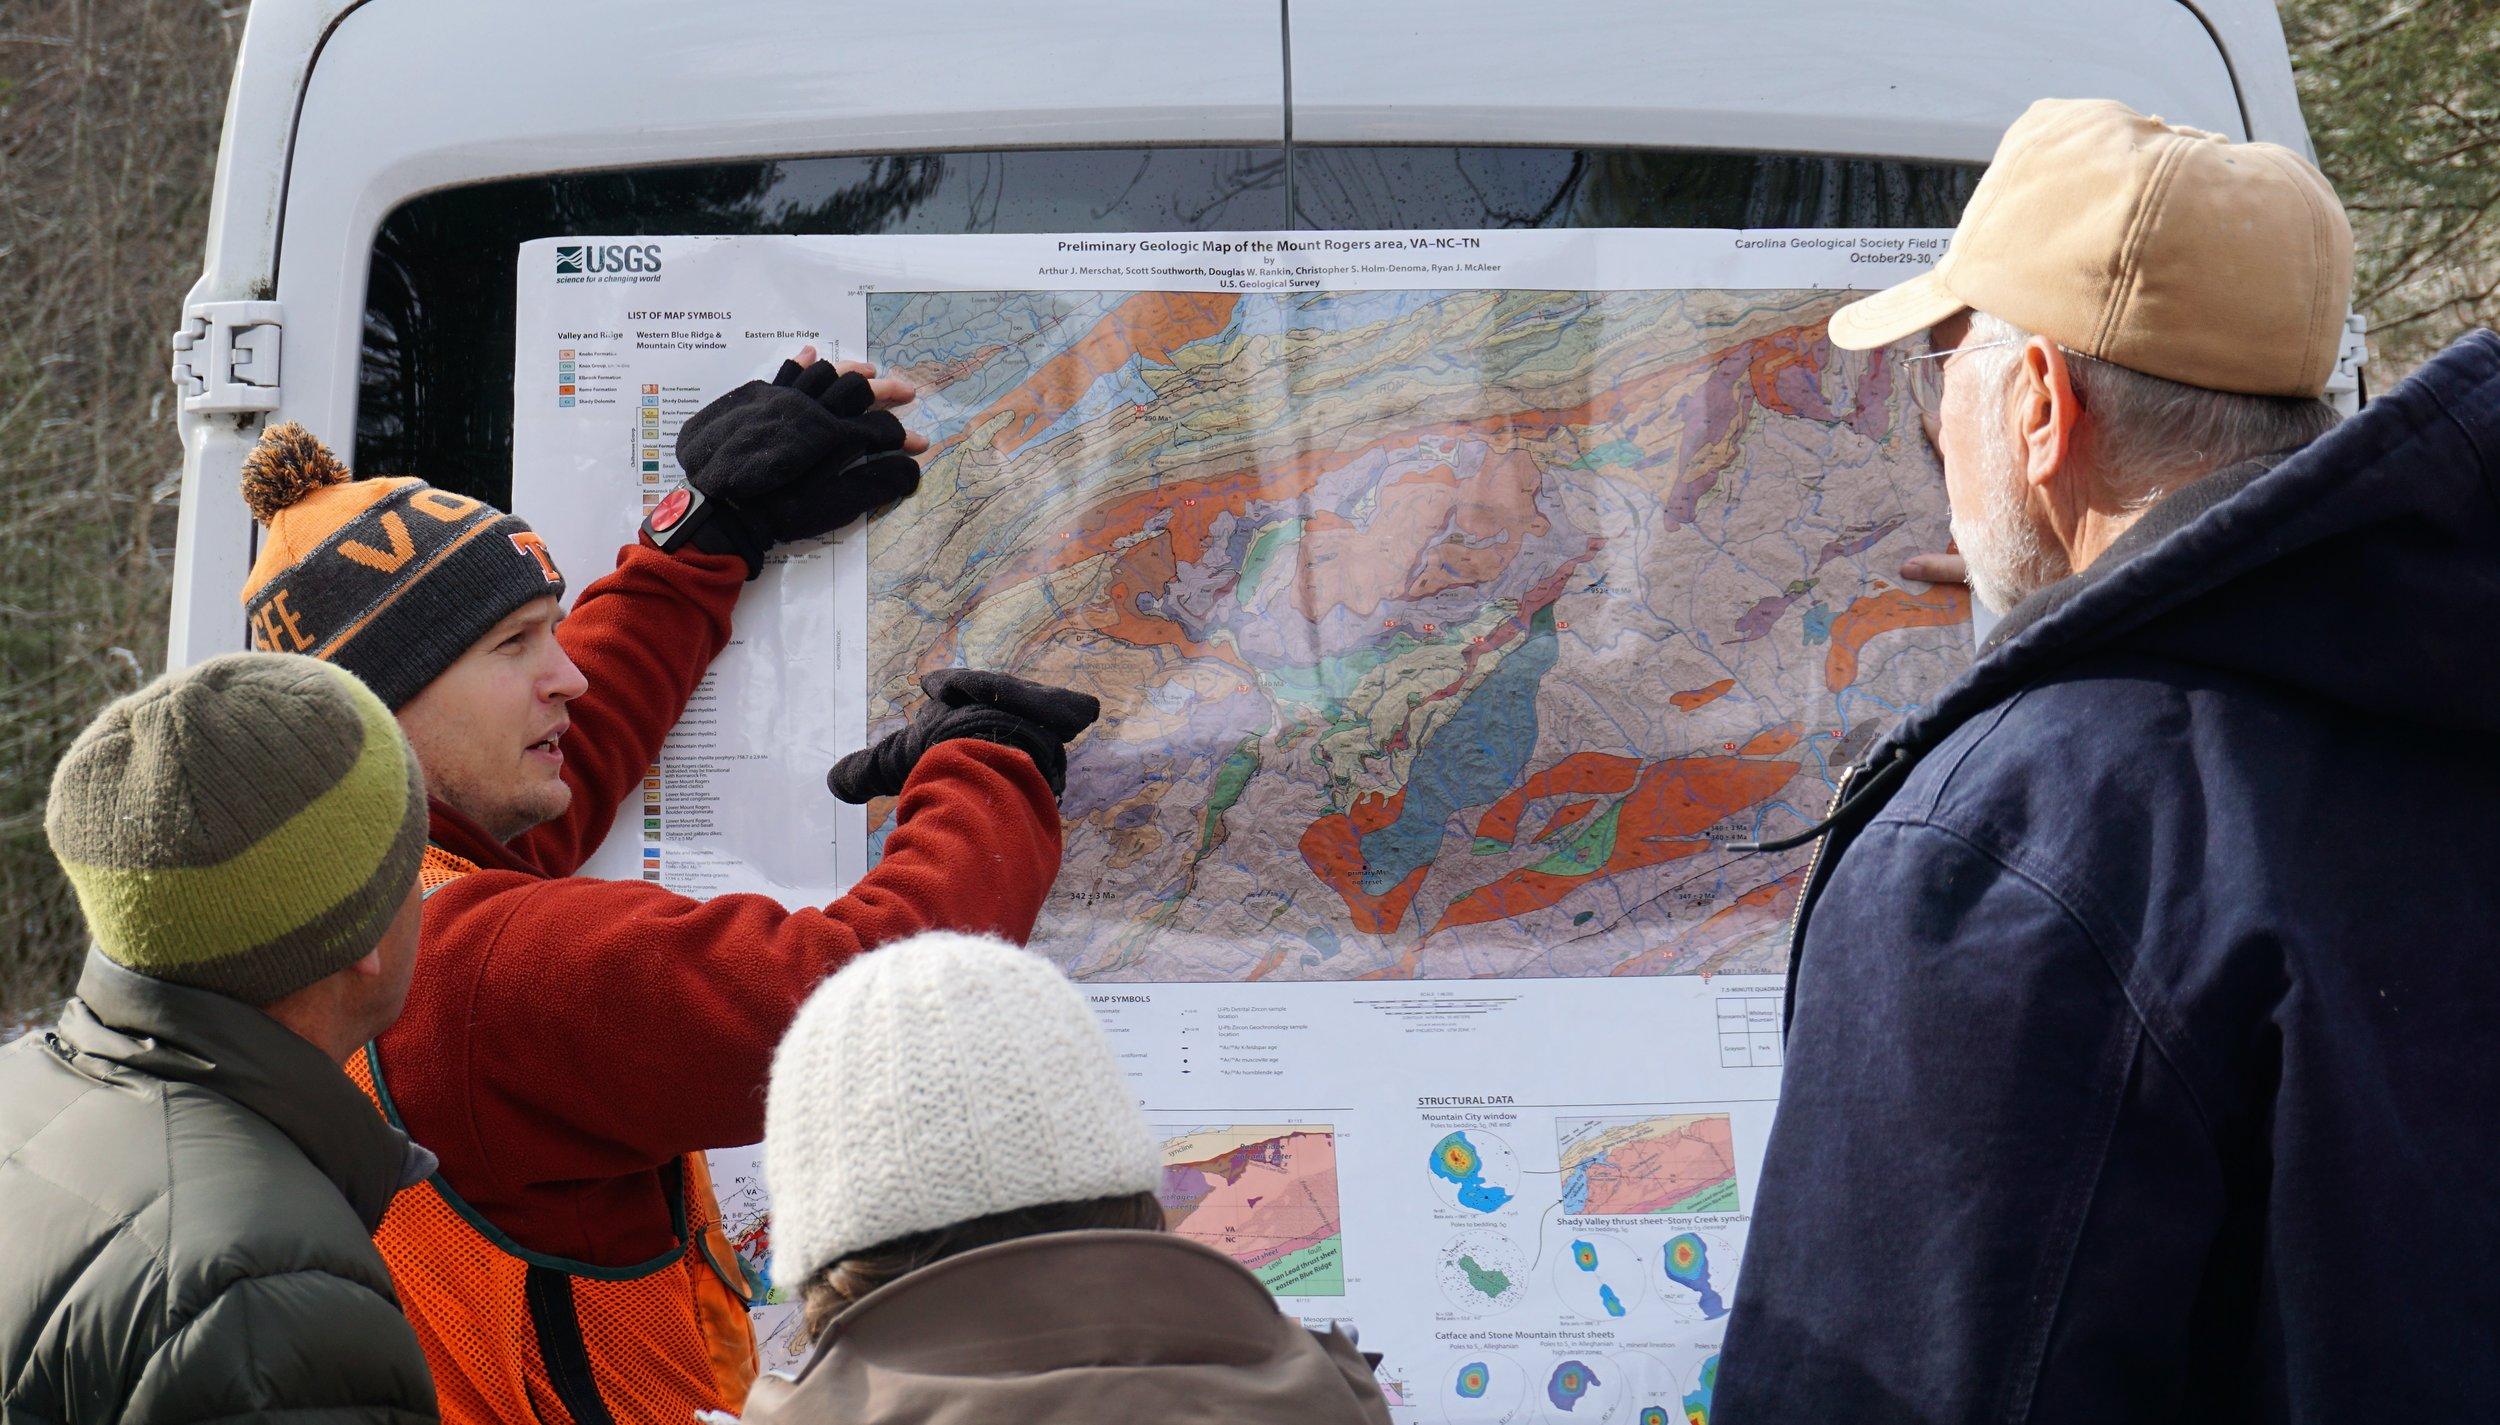 Arthur Merschat explaining our geological history on the USGS Geologic Map of Mt. Rogers Area (Merschat et. al., 2016).